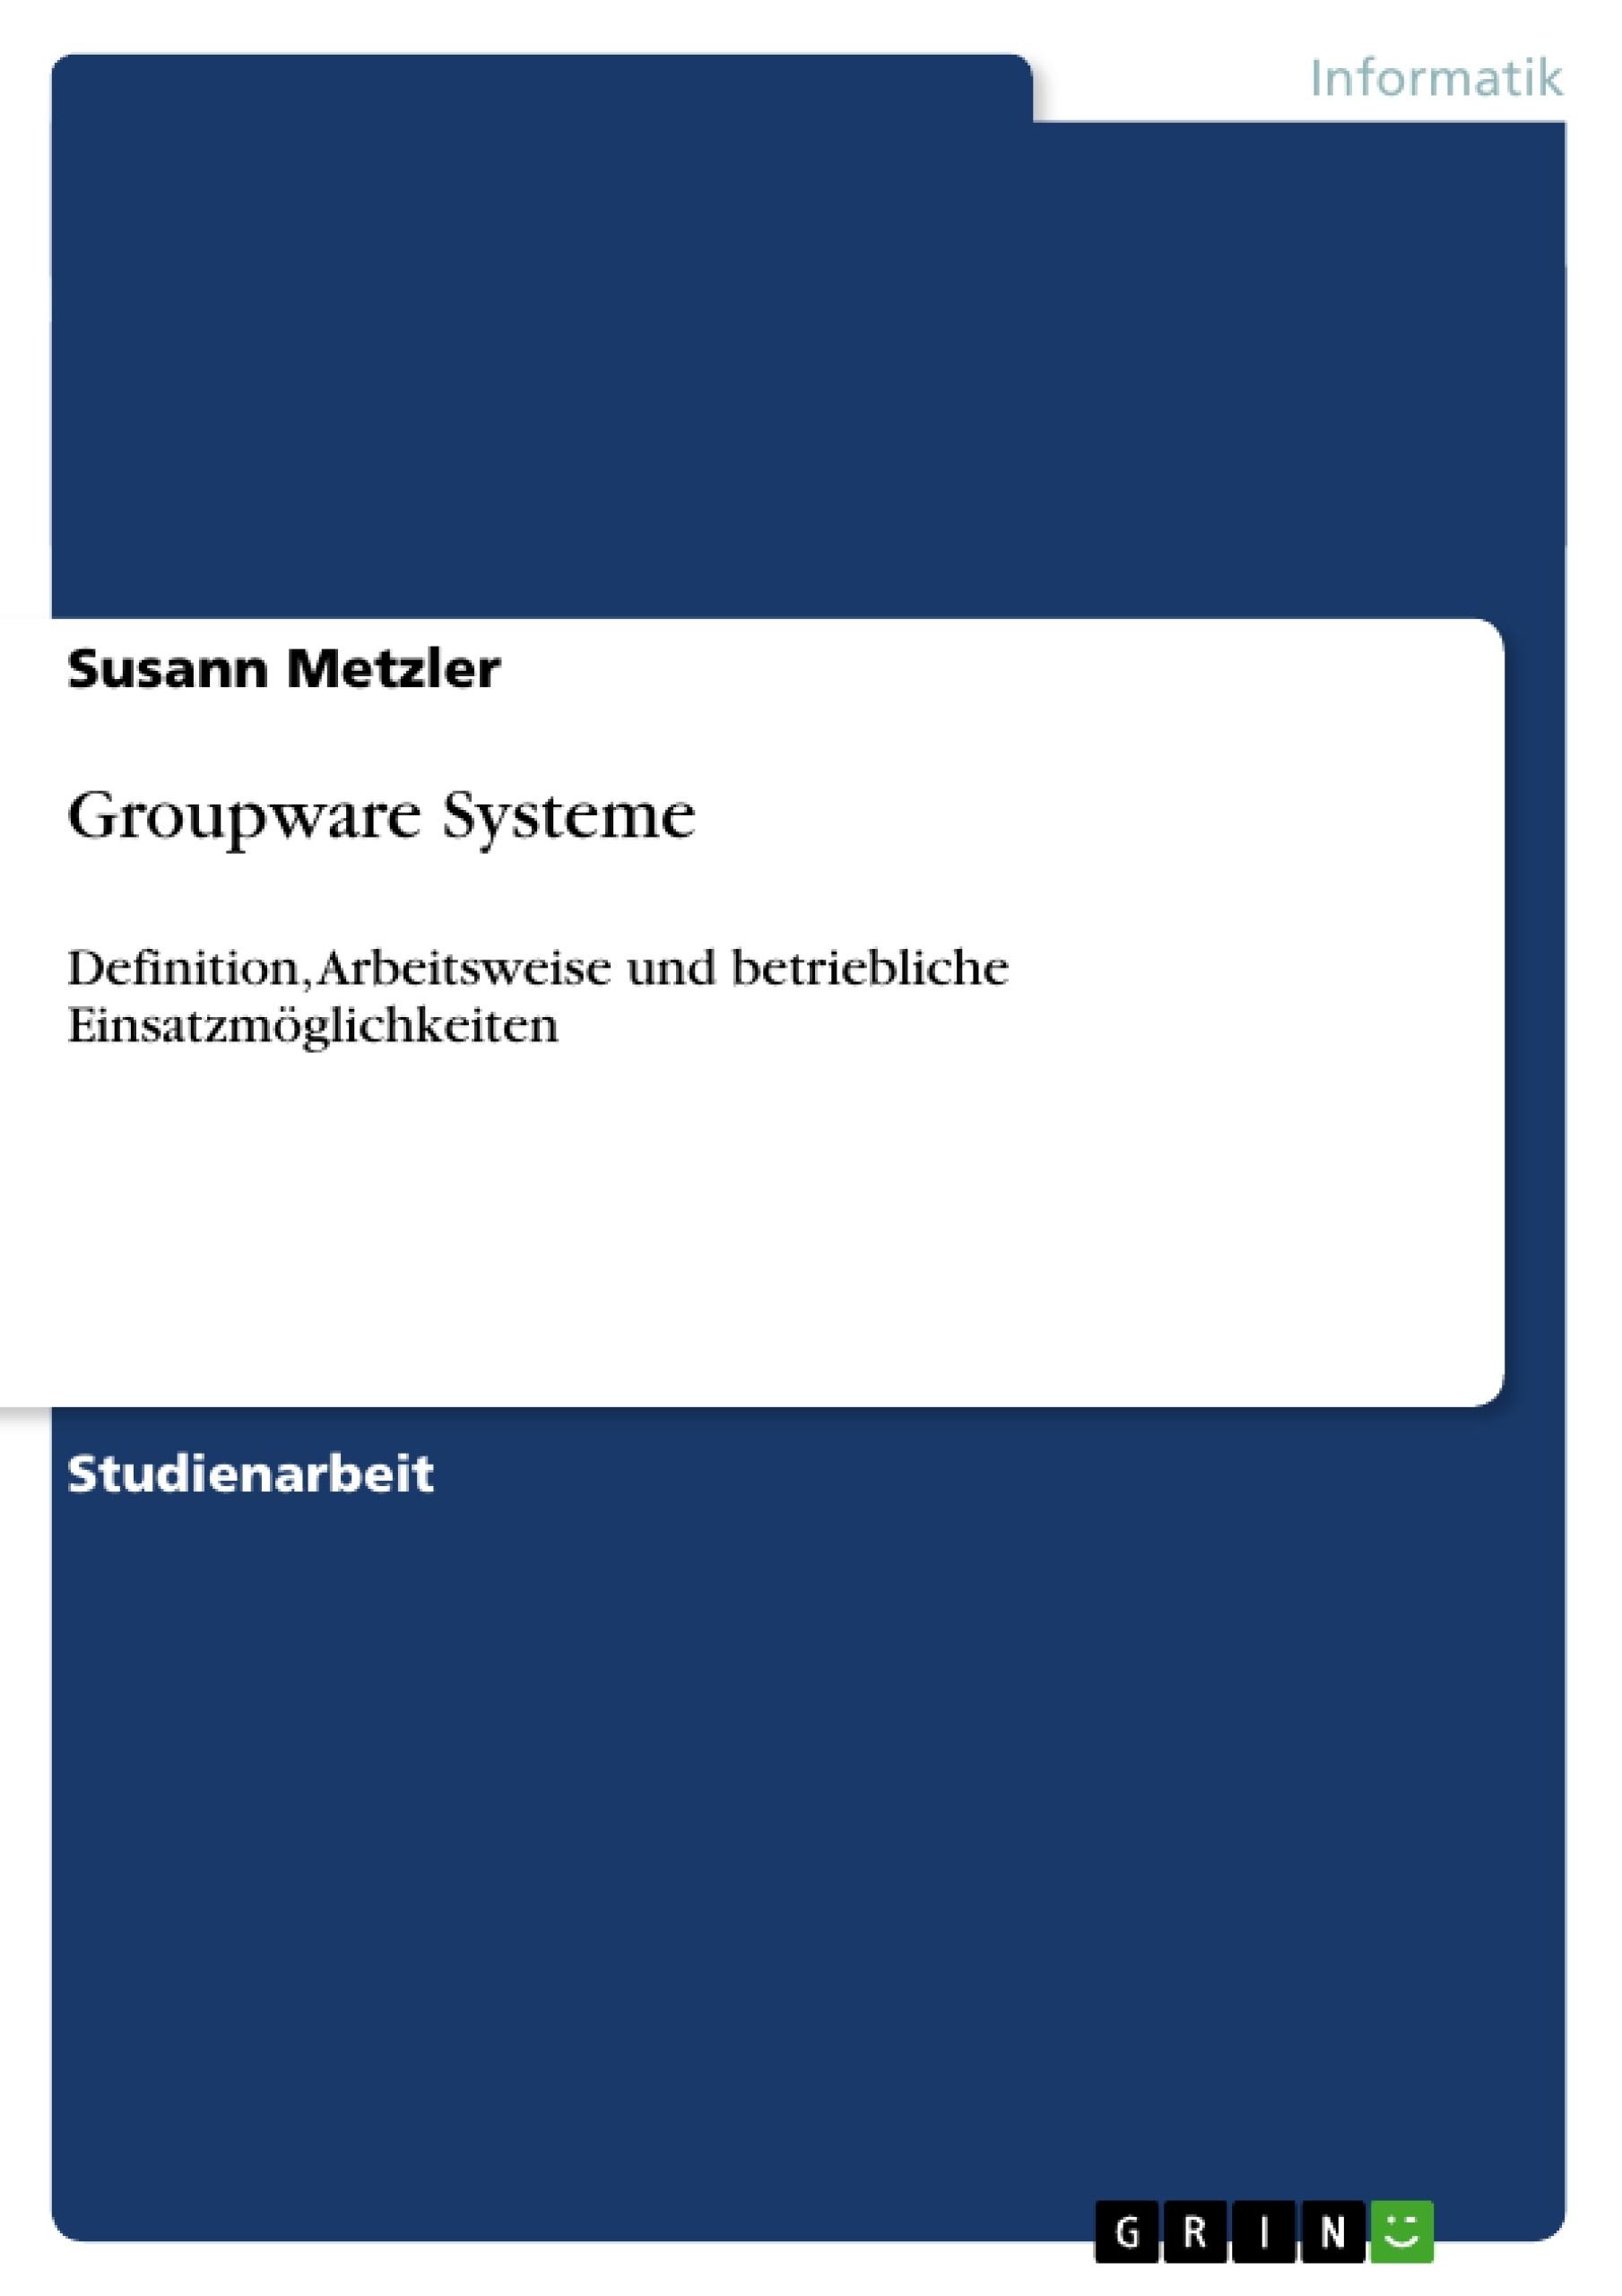 Titel: Groupware Systeme